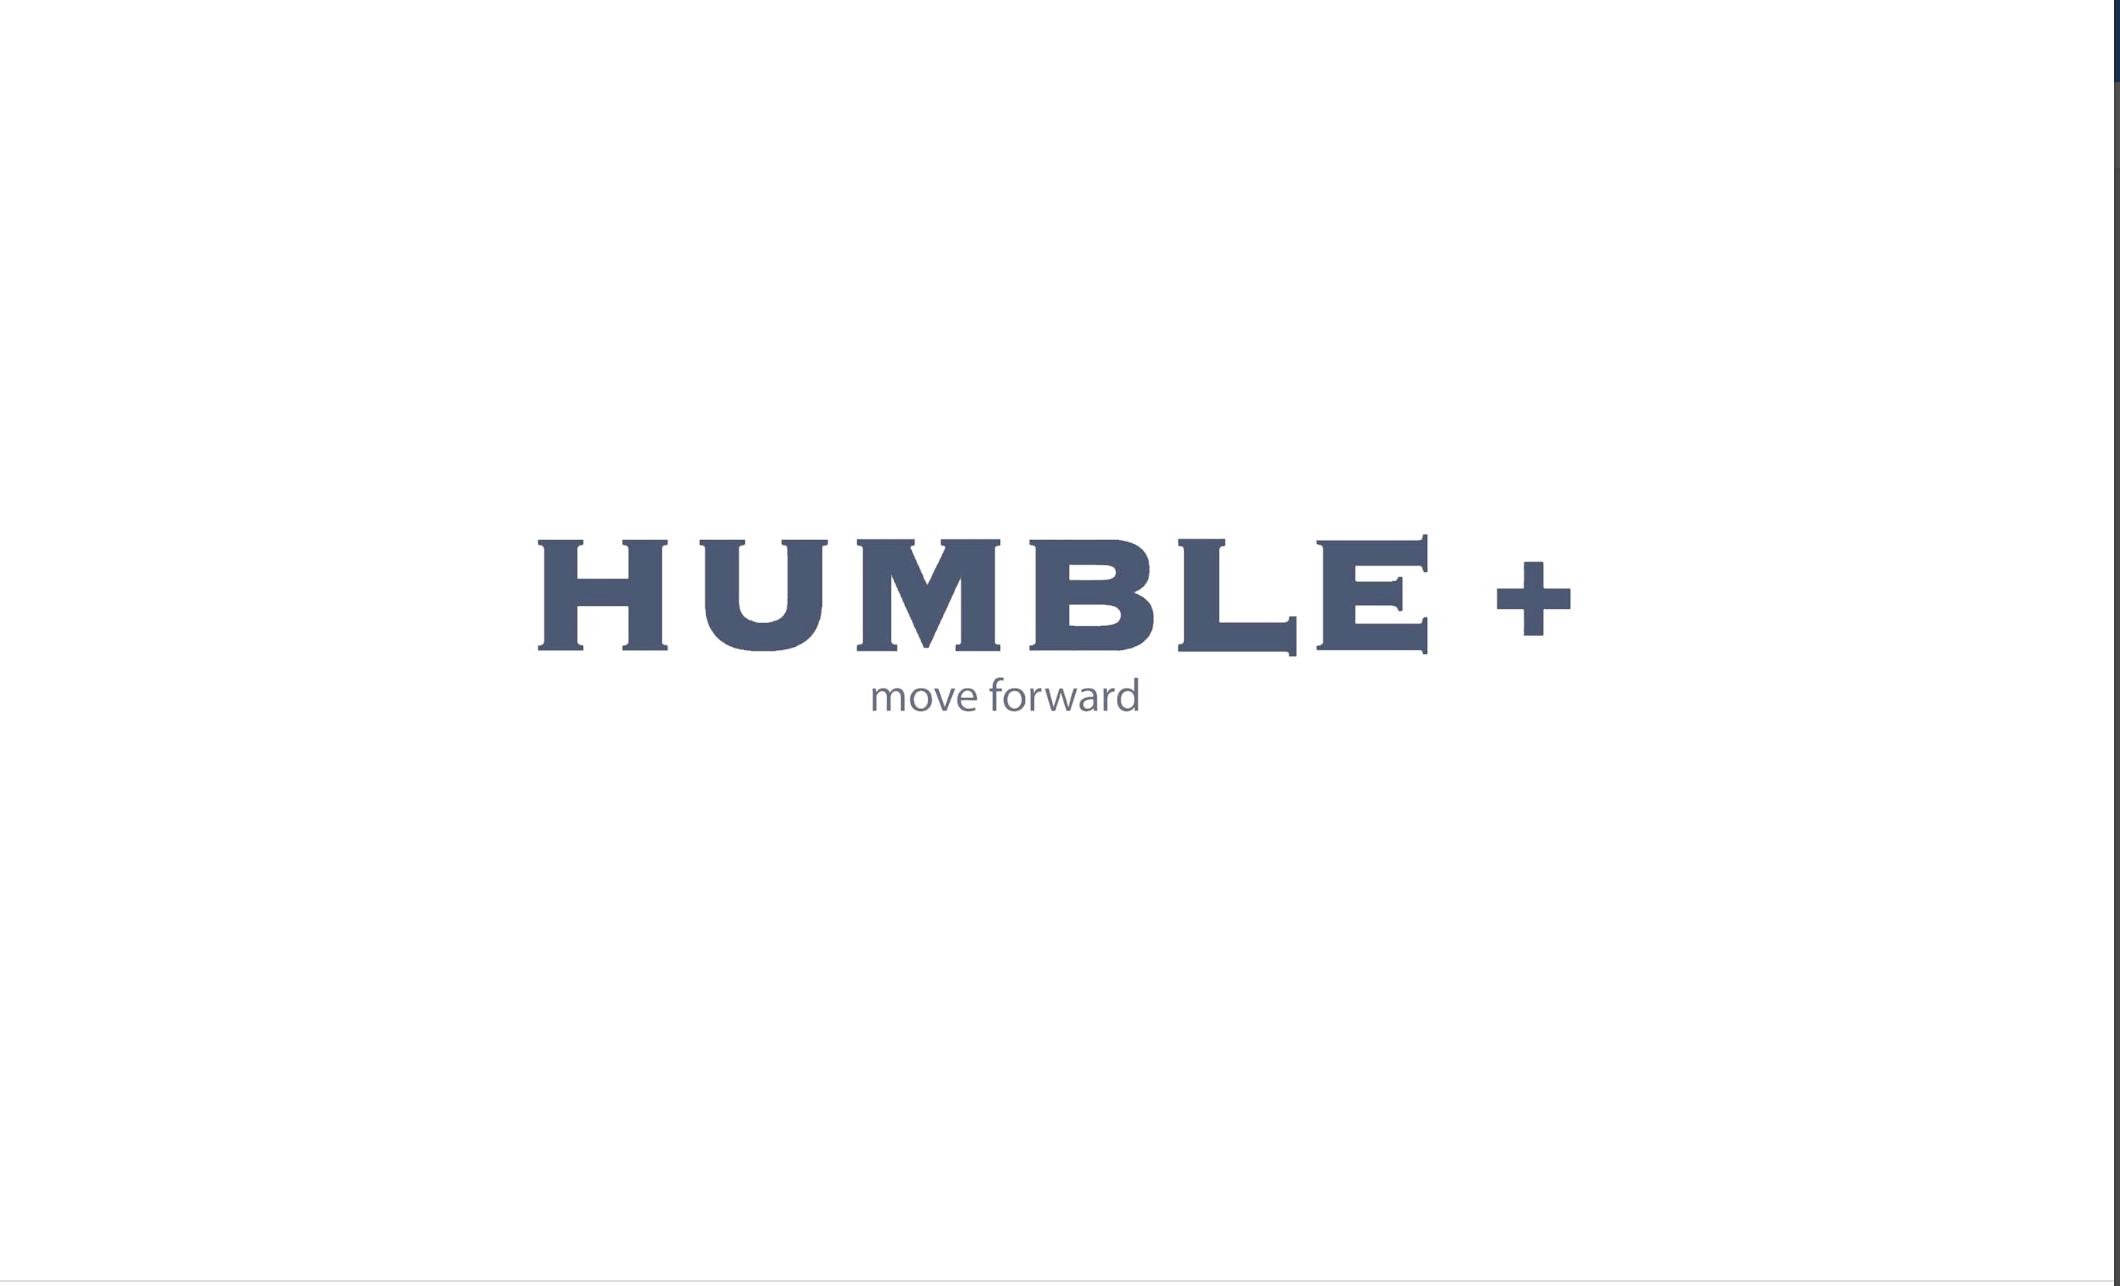 Humble+